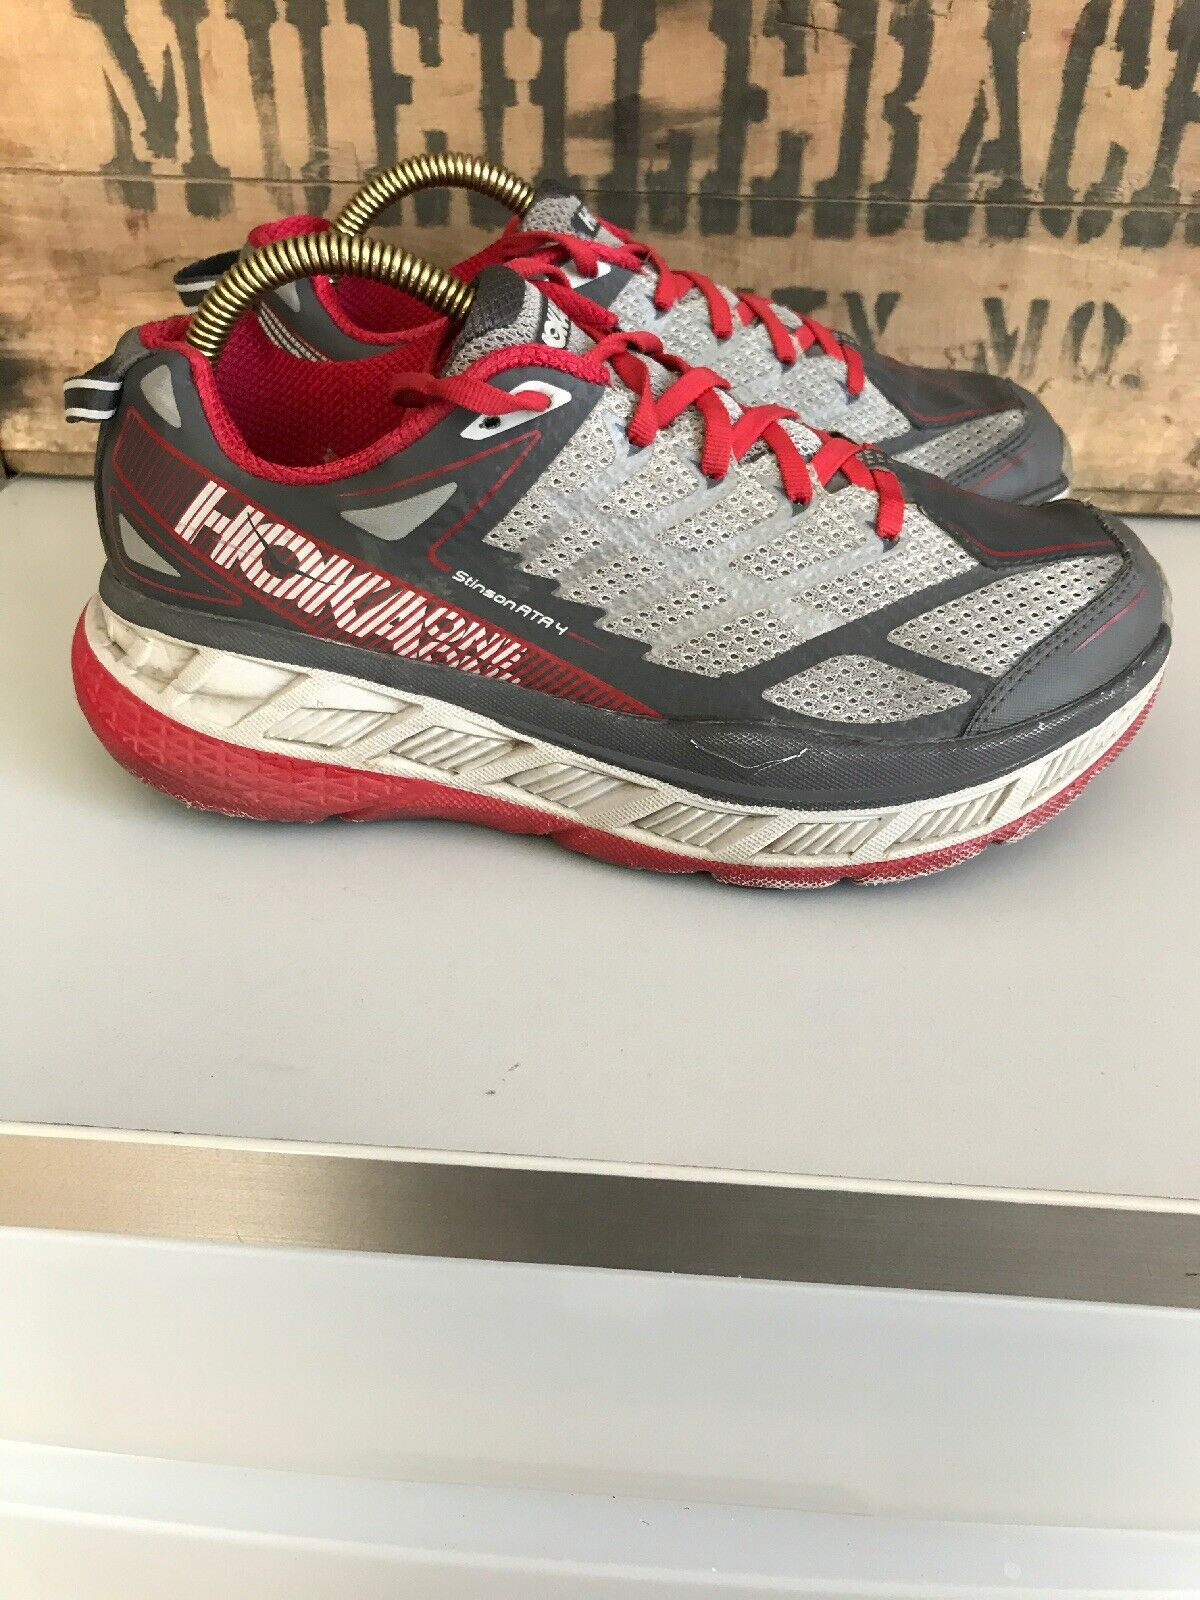 Hoka One One STINSON ATR 4 para hombre Athletic Trail Running zapatos 7 Rojo gris